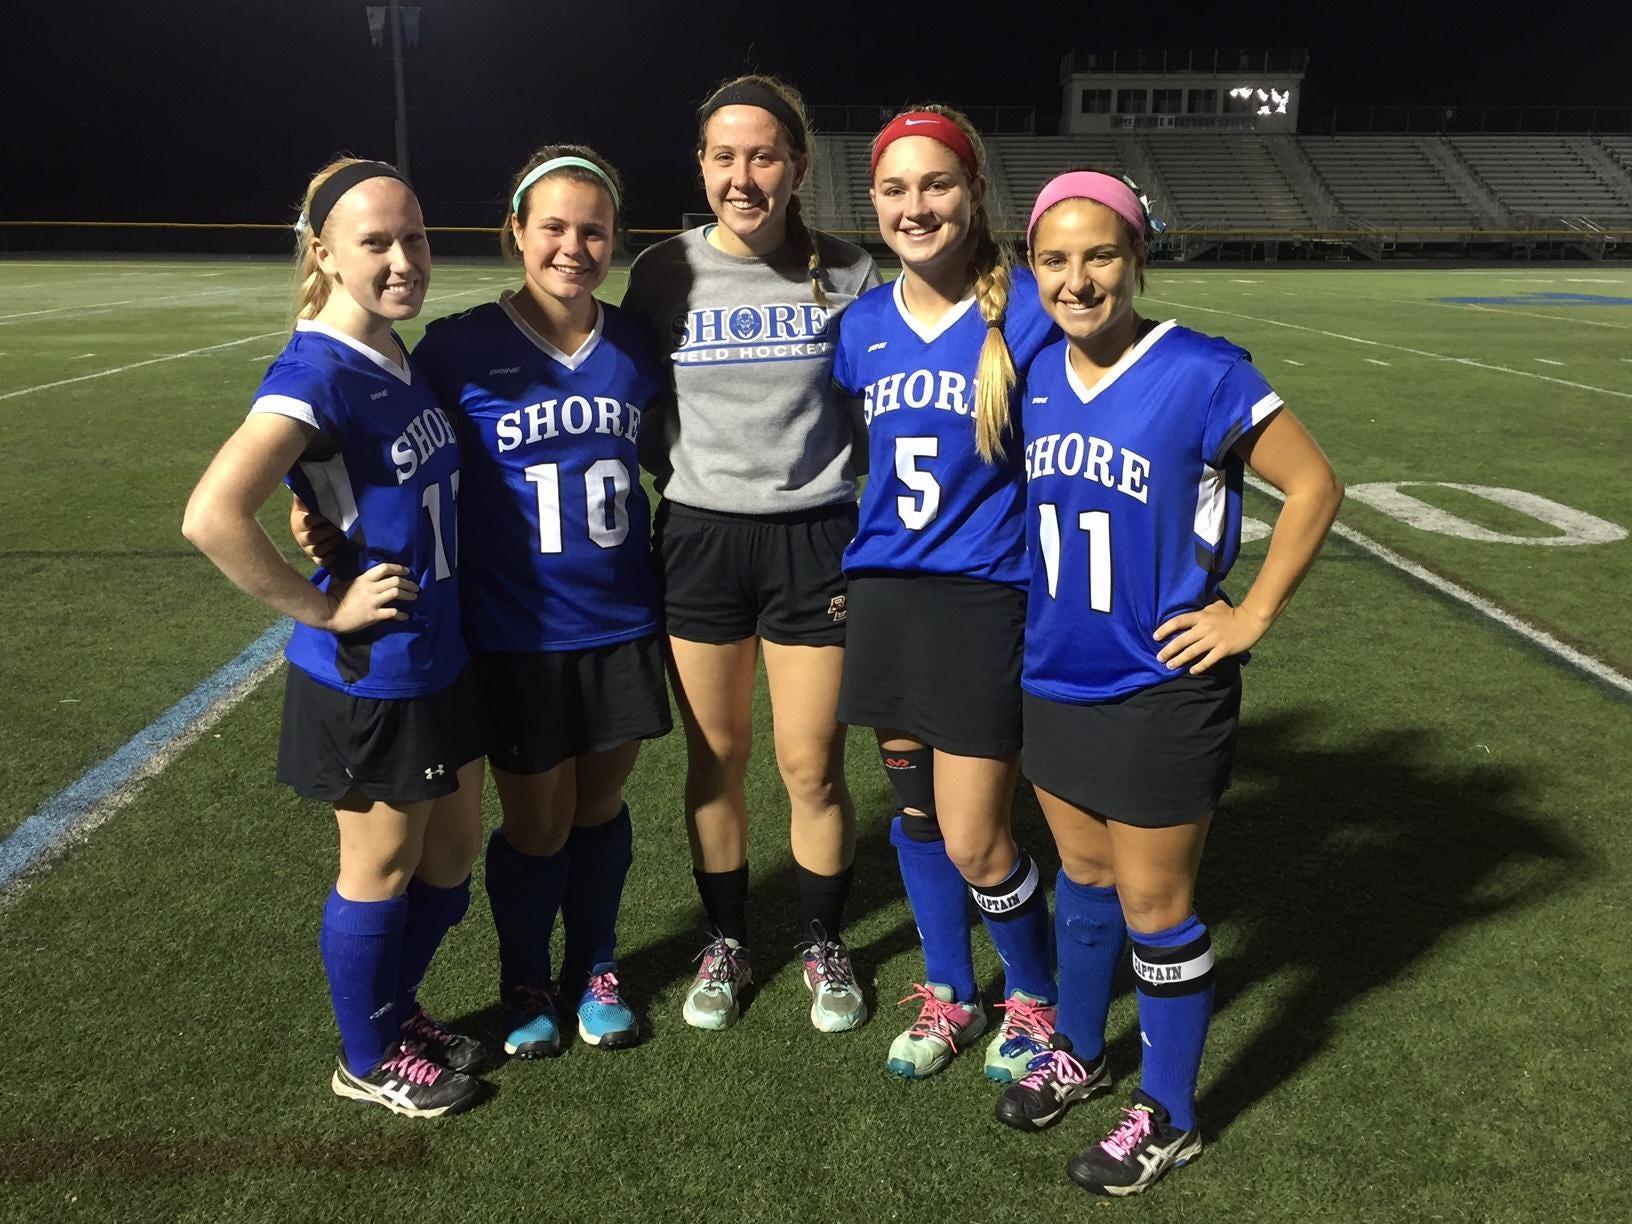 The Shore Regional field hockey senior class. From L-R (Julianne Hurley, Reese Collin, Sarah Dwyer, Jessica Welch, Annie Deusch).